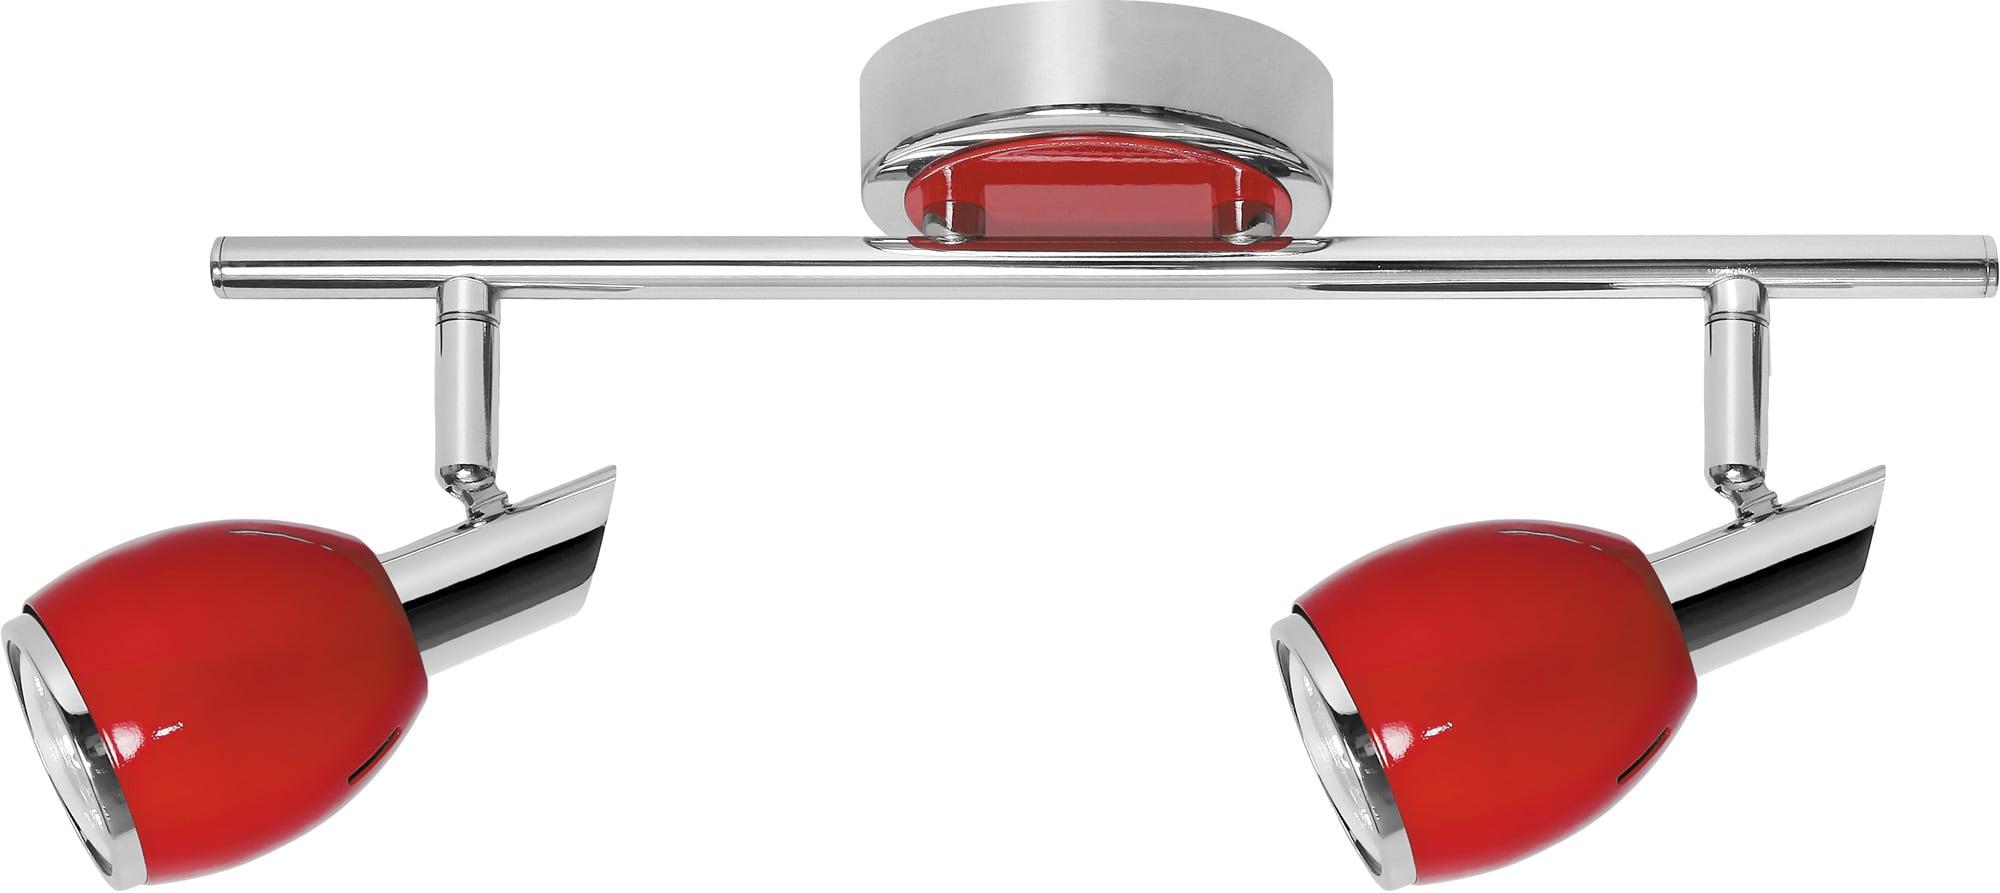 Strip Spot Double Red Colors Chrome GU10